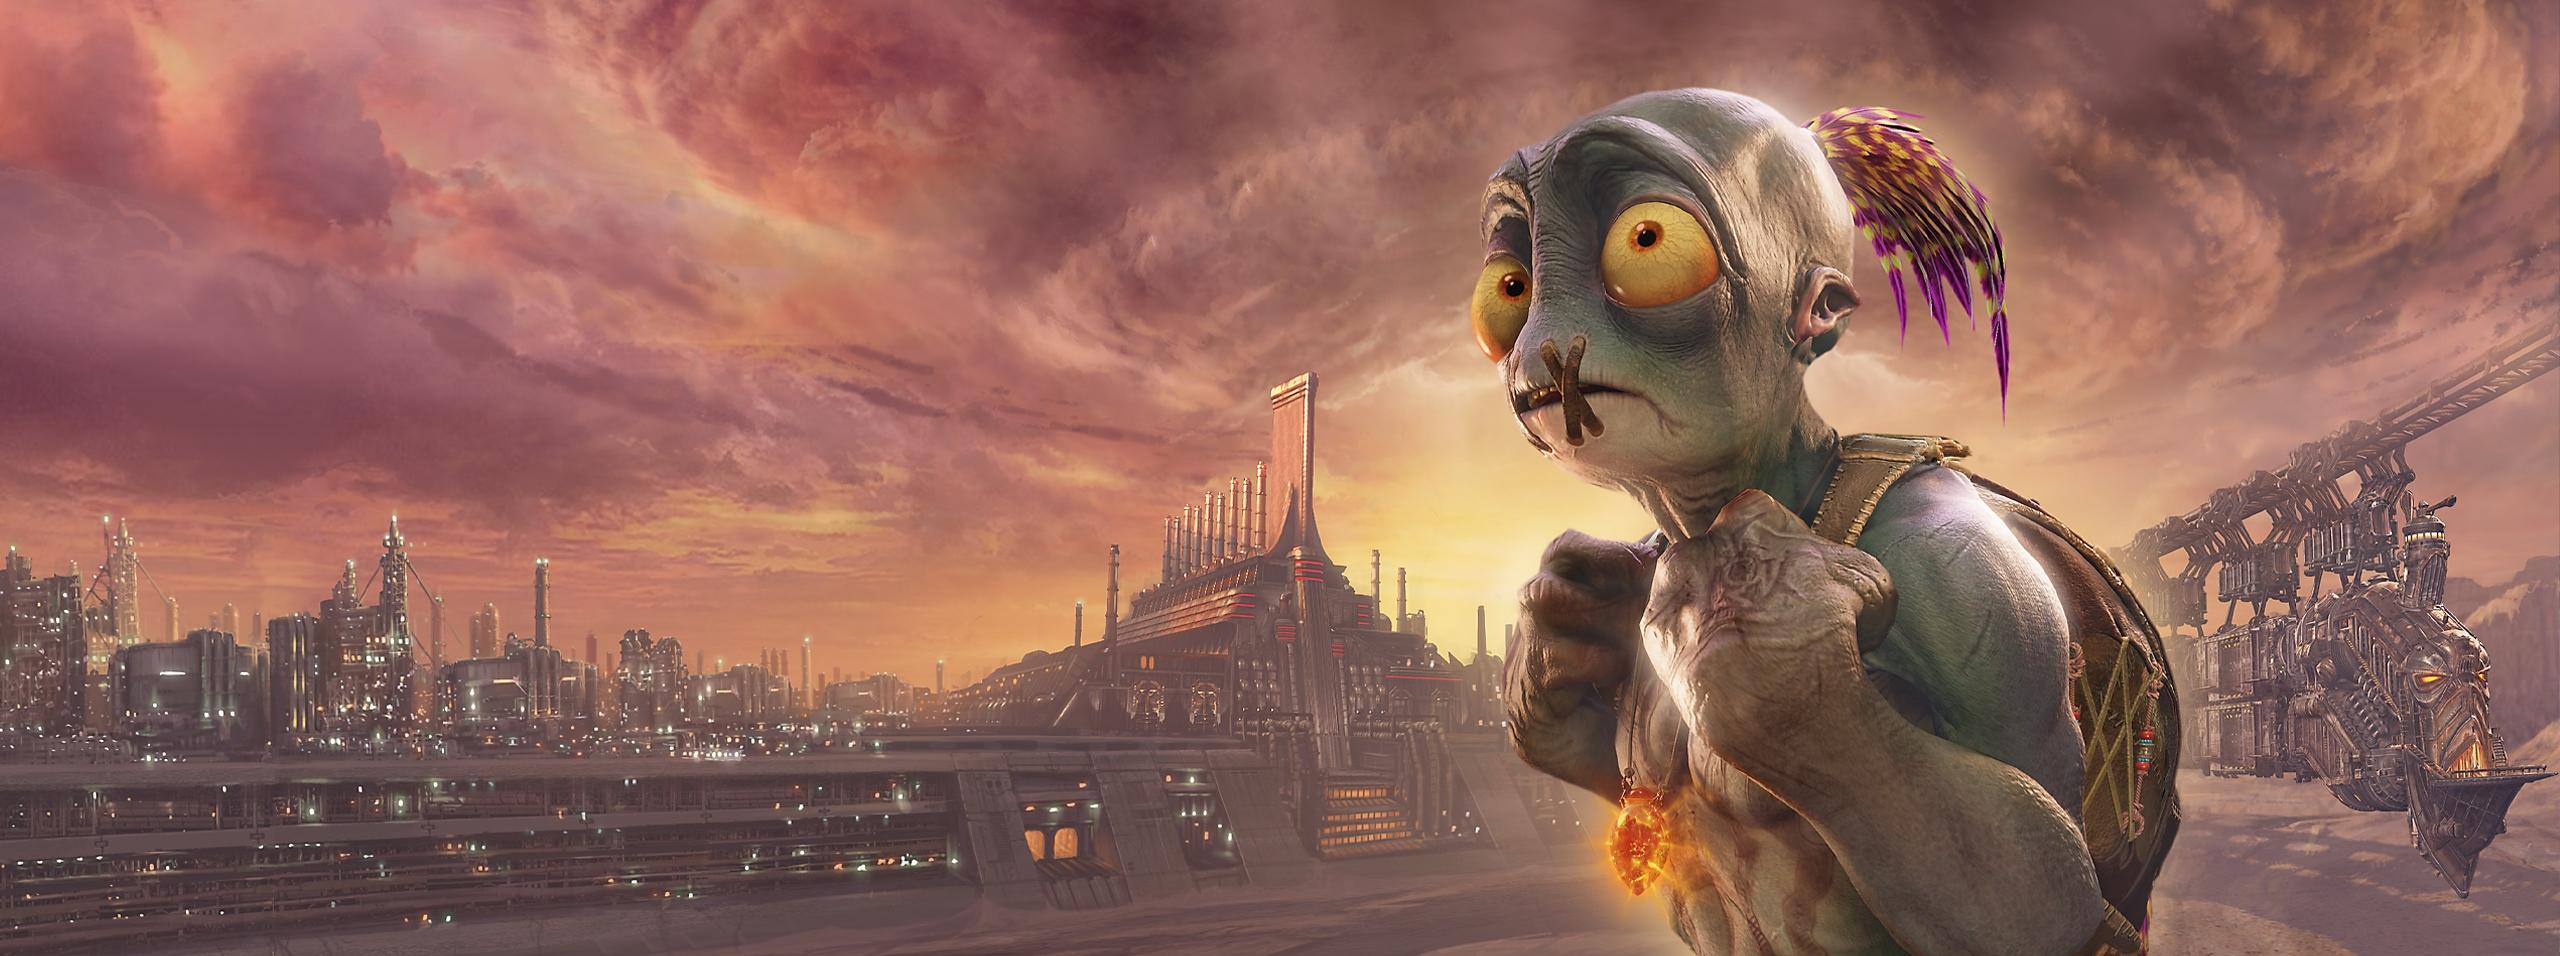 Oddworld: Soulstorm - Key Art